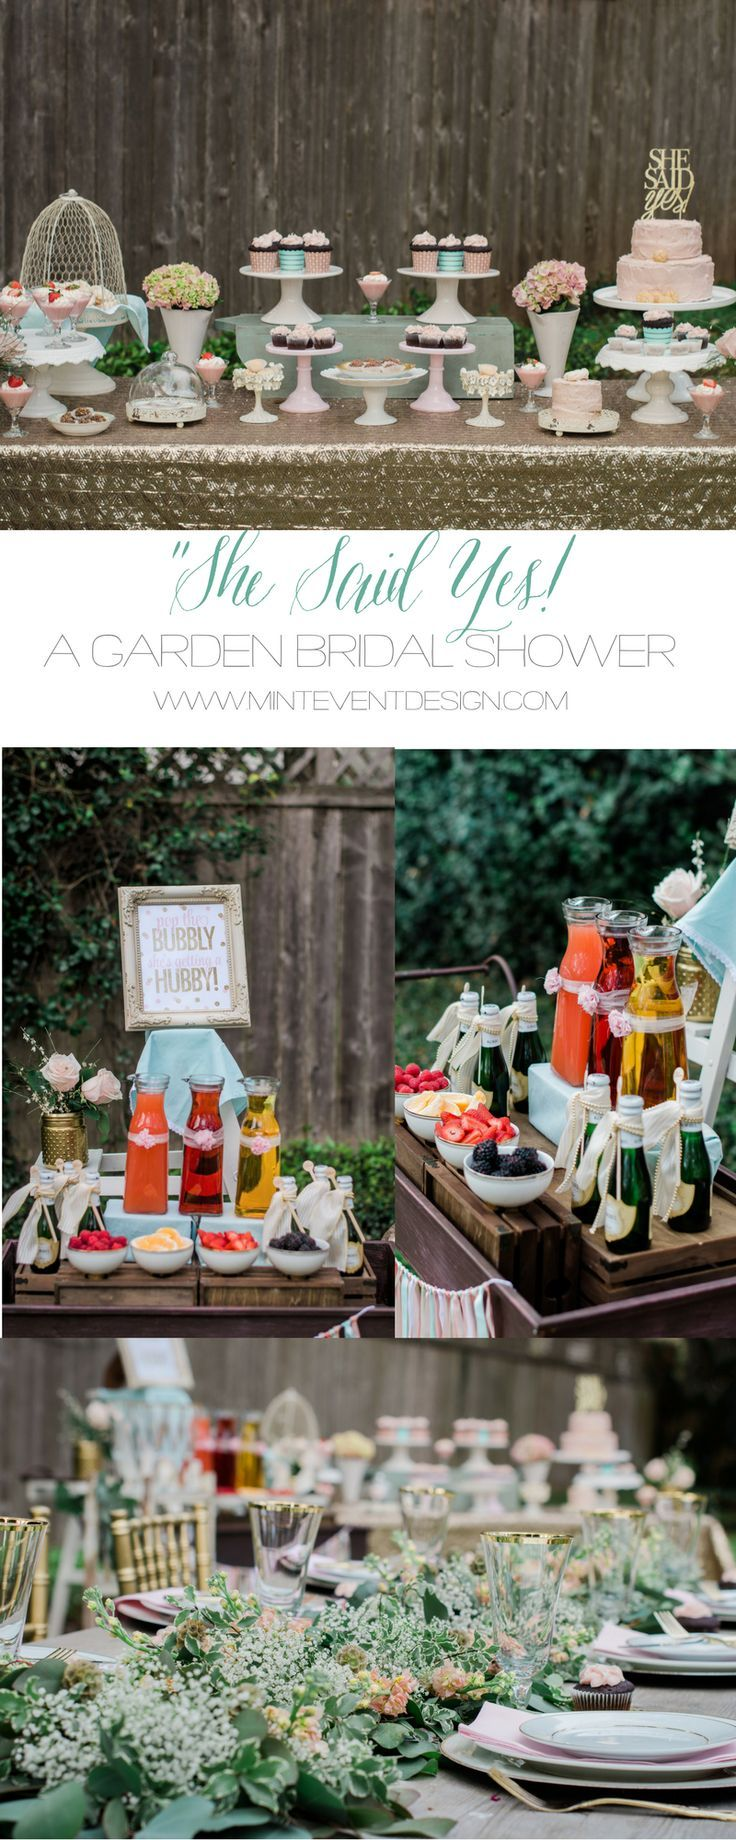 Garden decor for baby shower  A Beautiful Bridal Shower Brunch